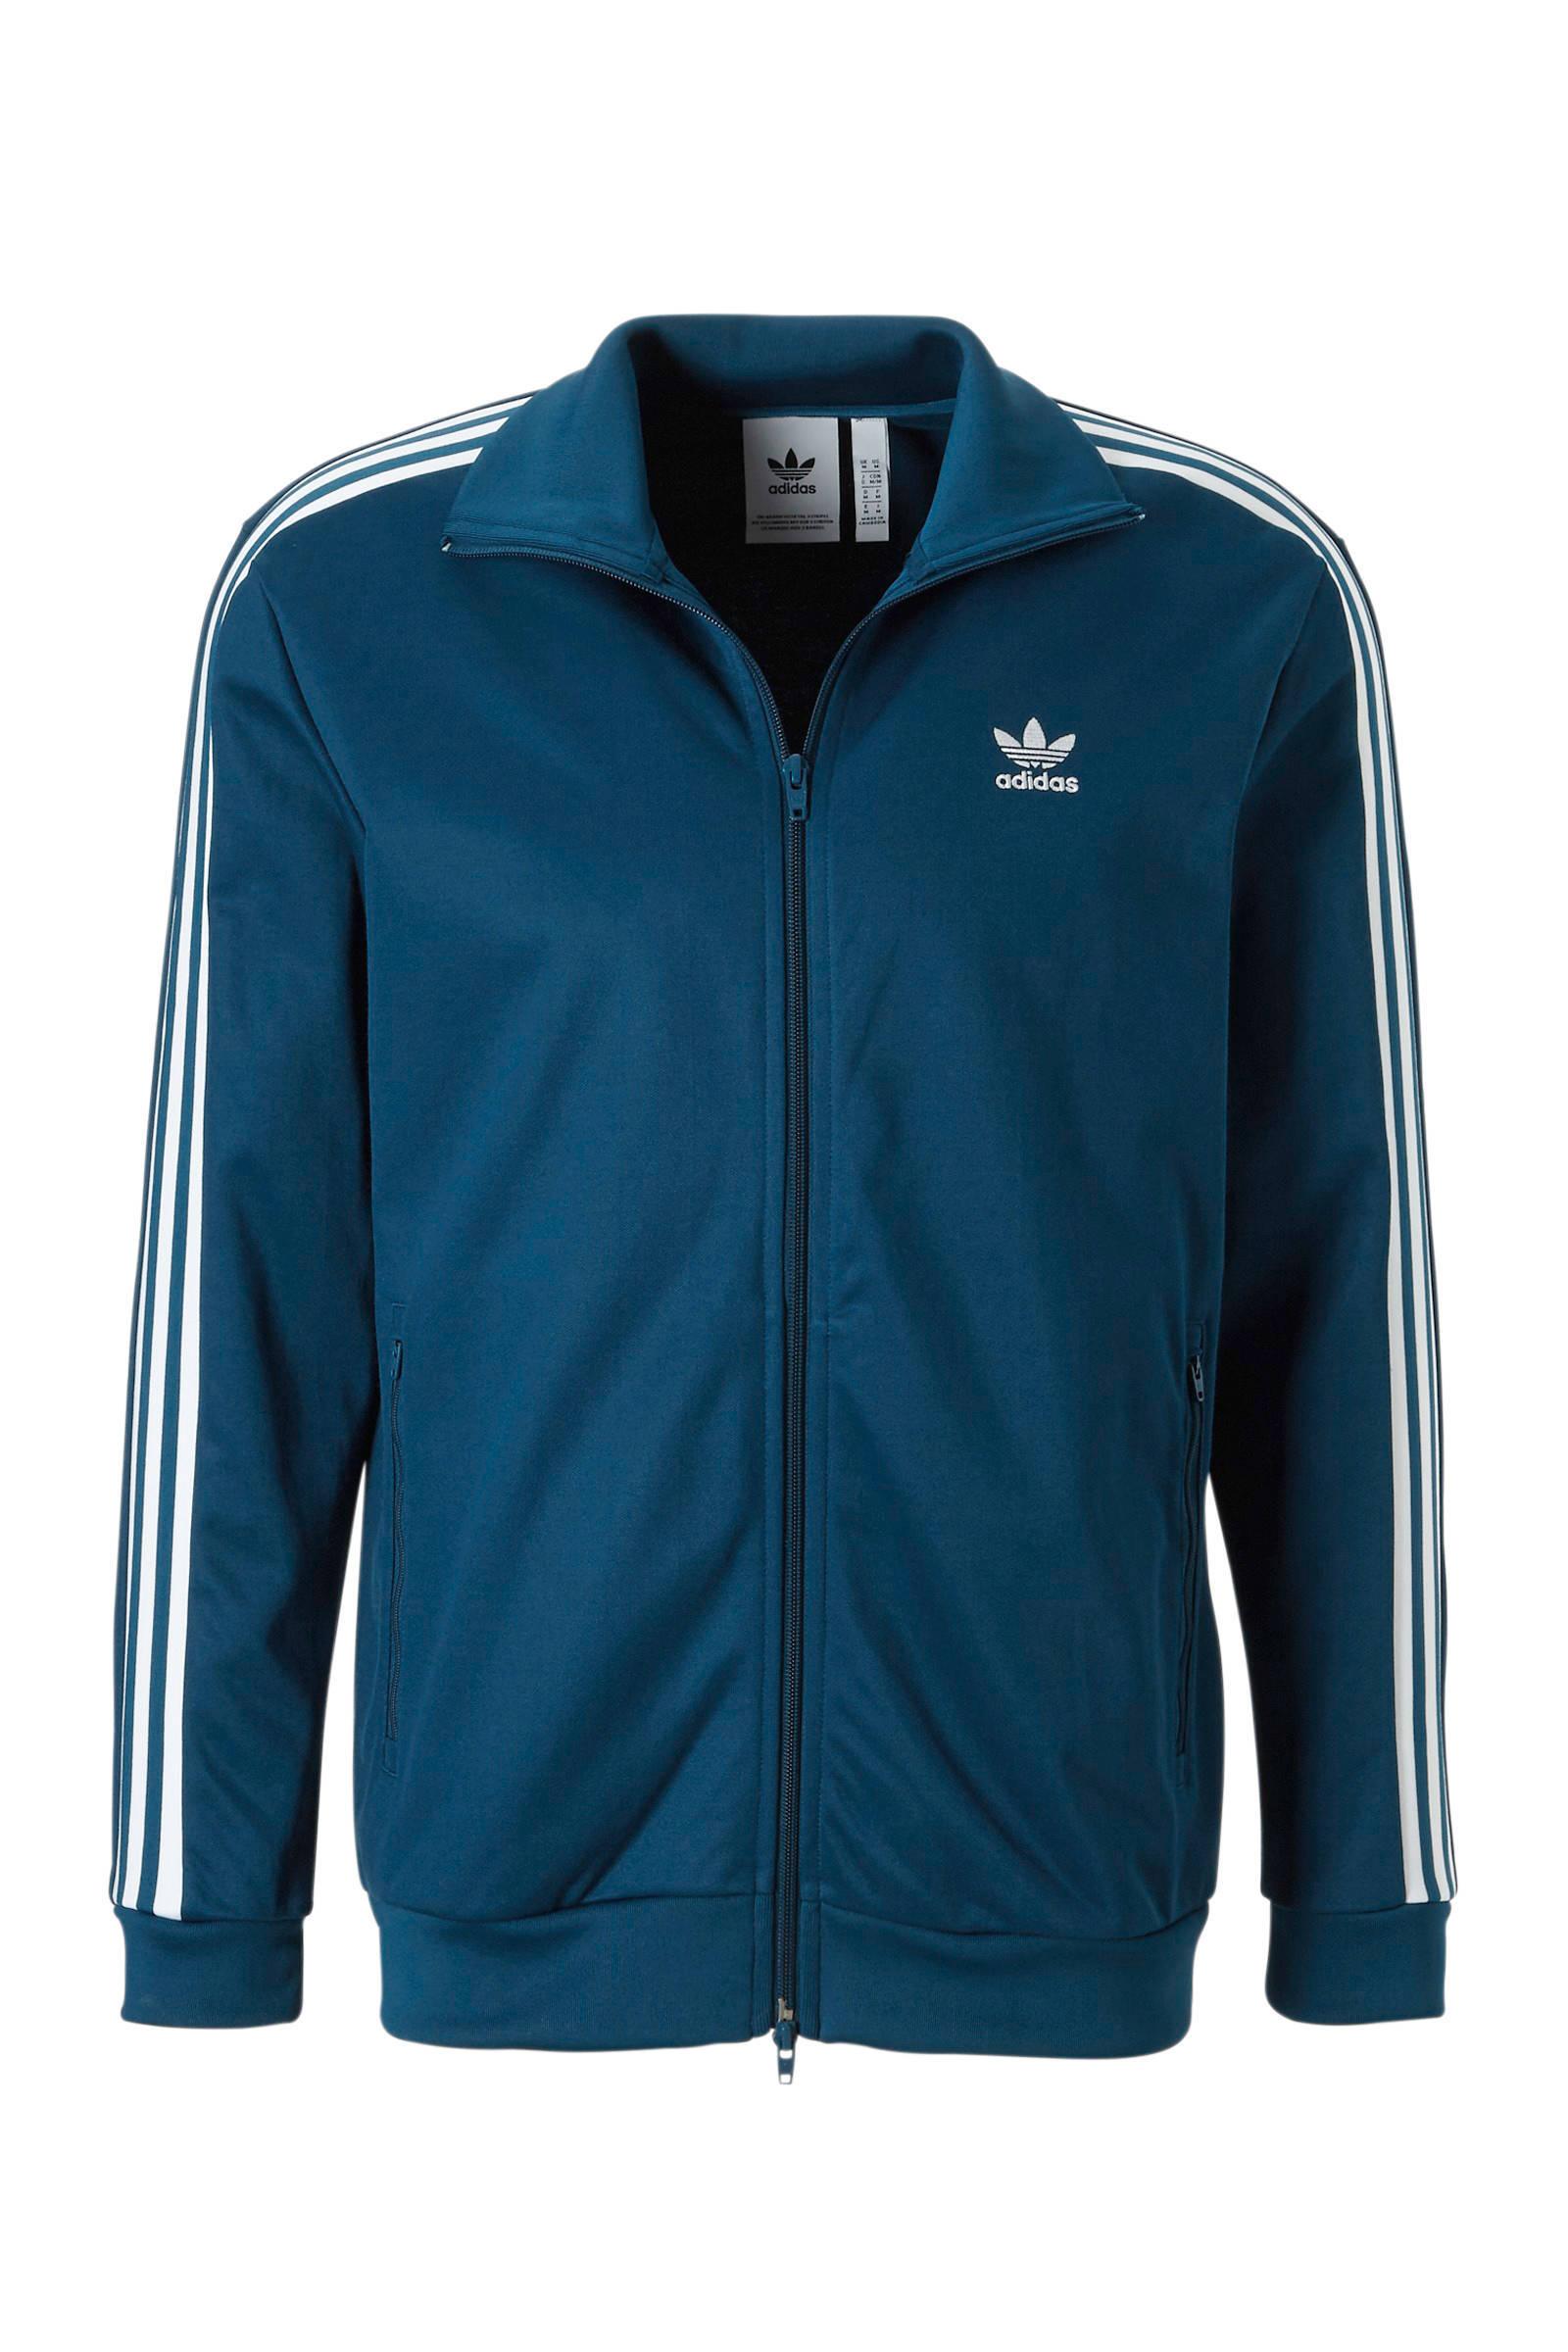 12ccd05b8b9 adidas originals vest blauw | wehkamp